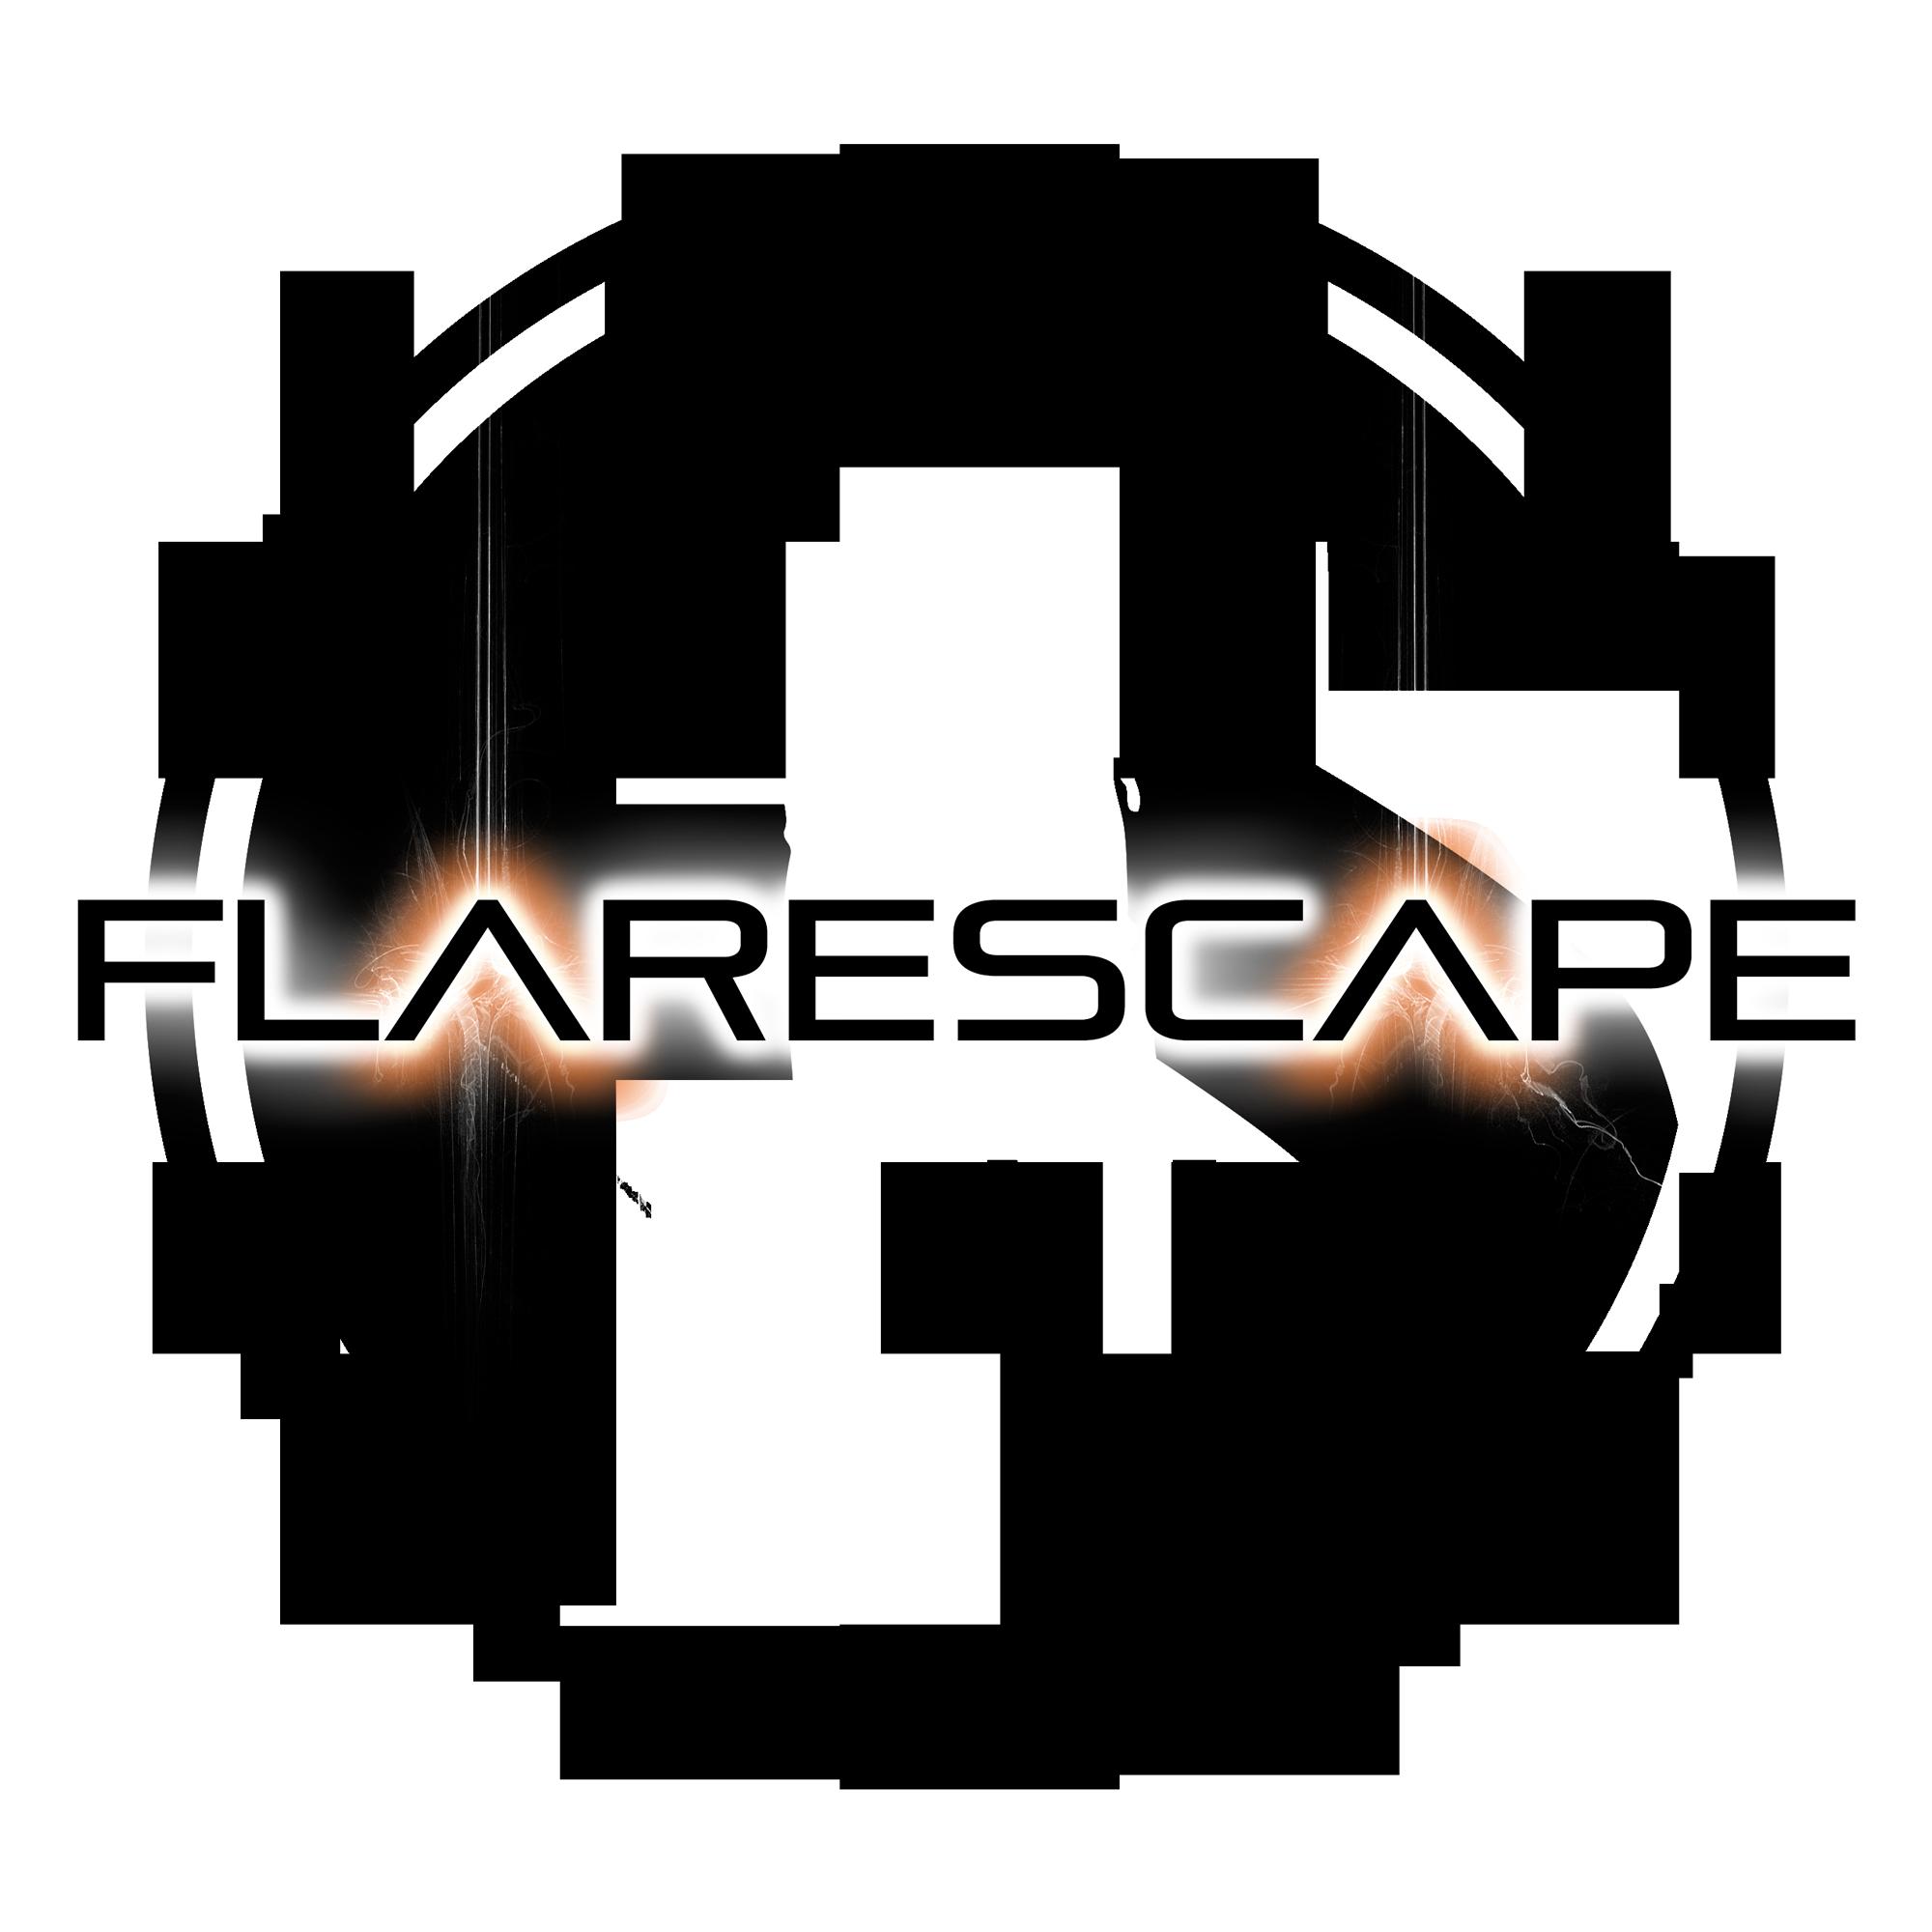 Flarescape logo design